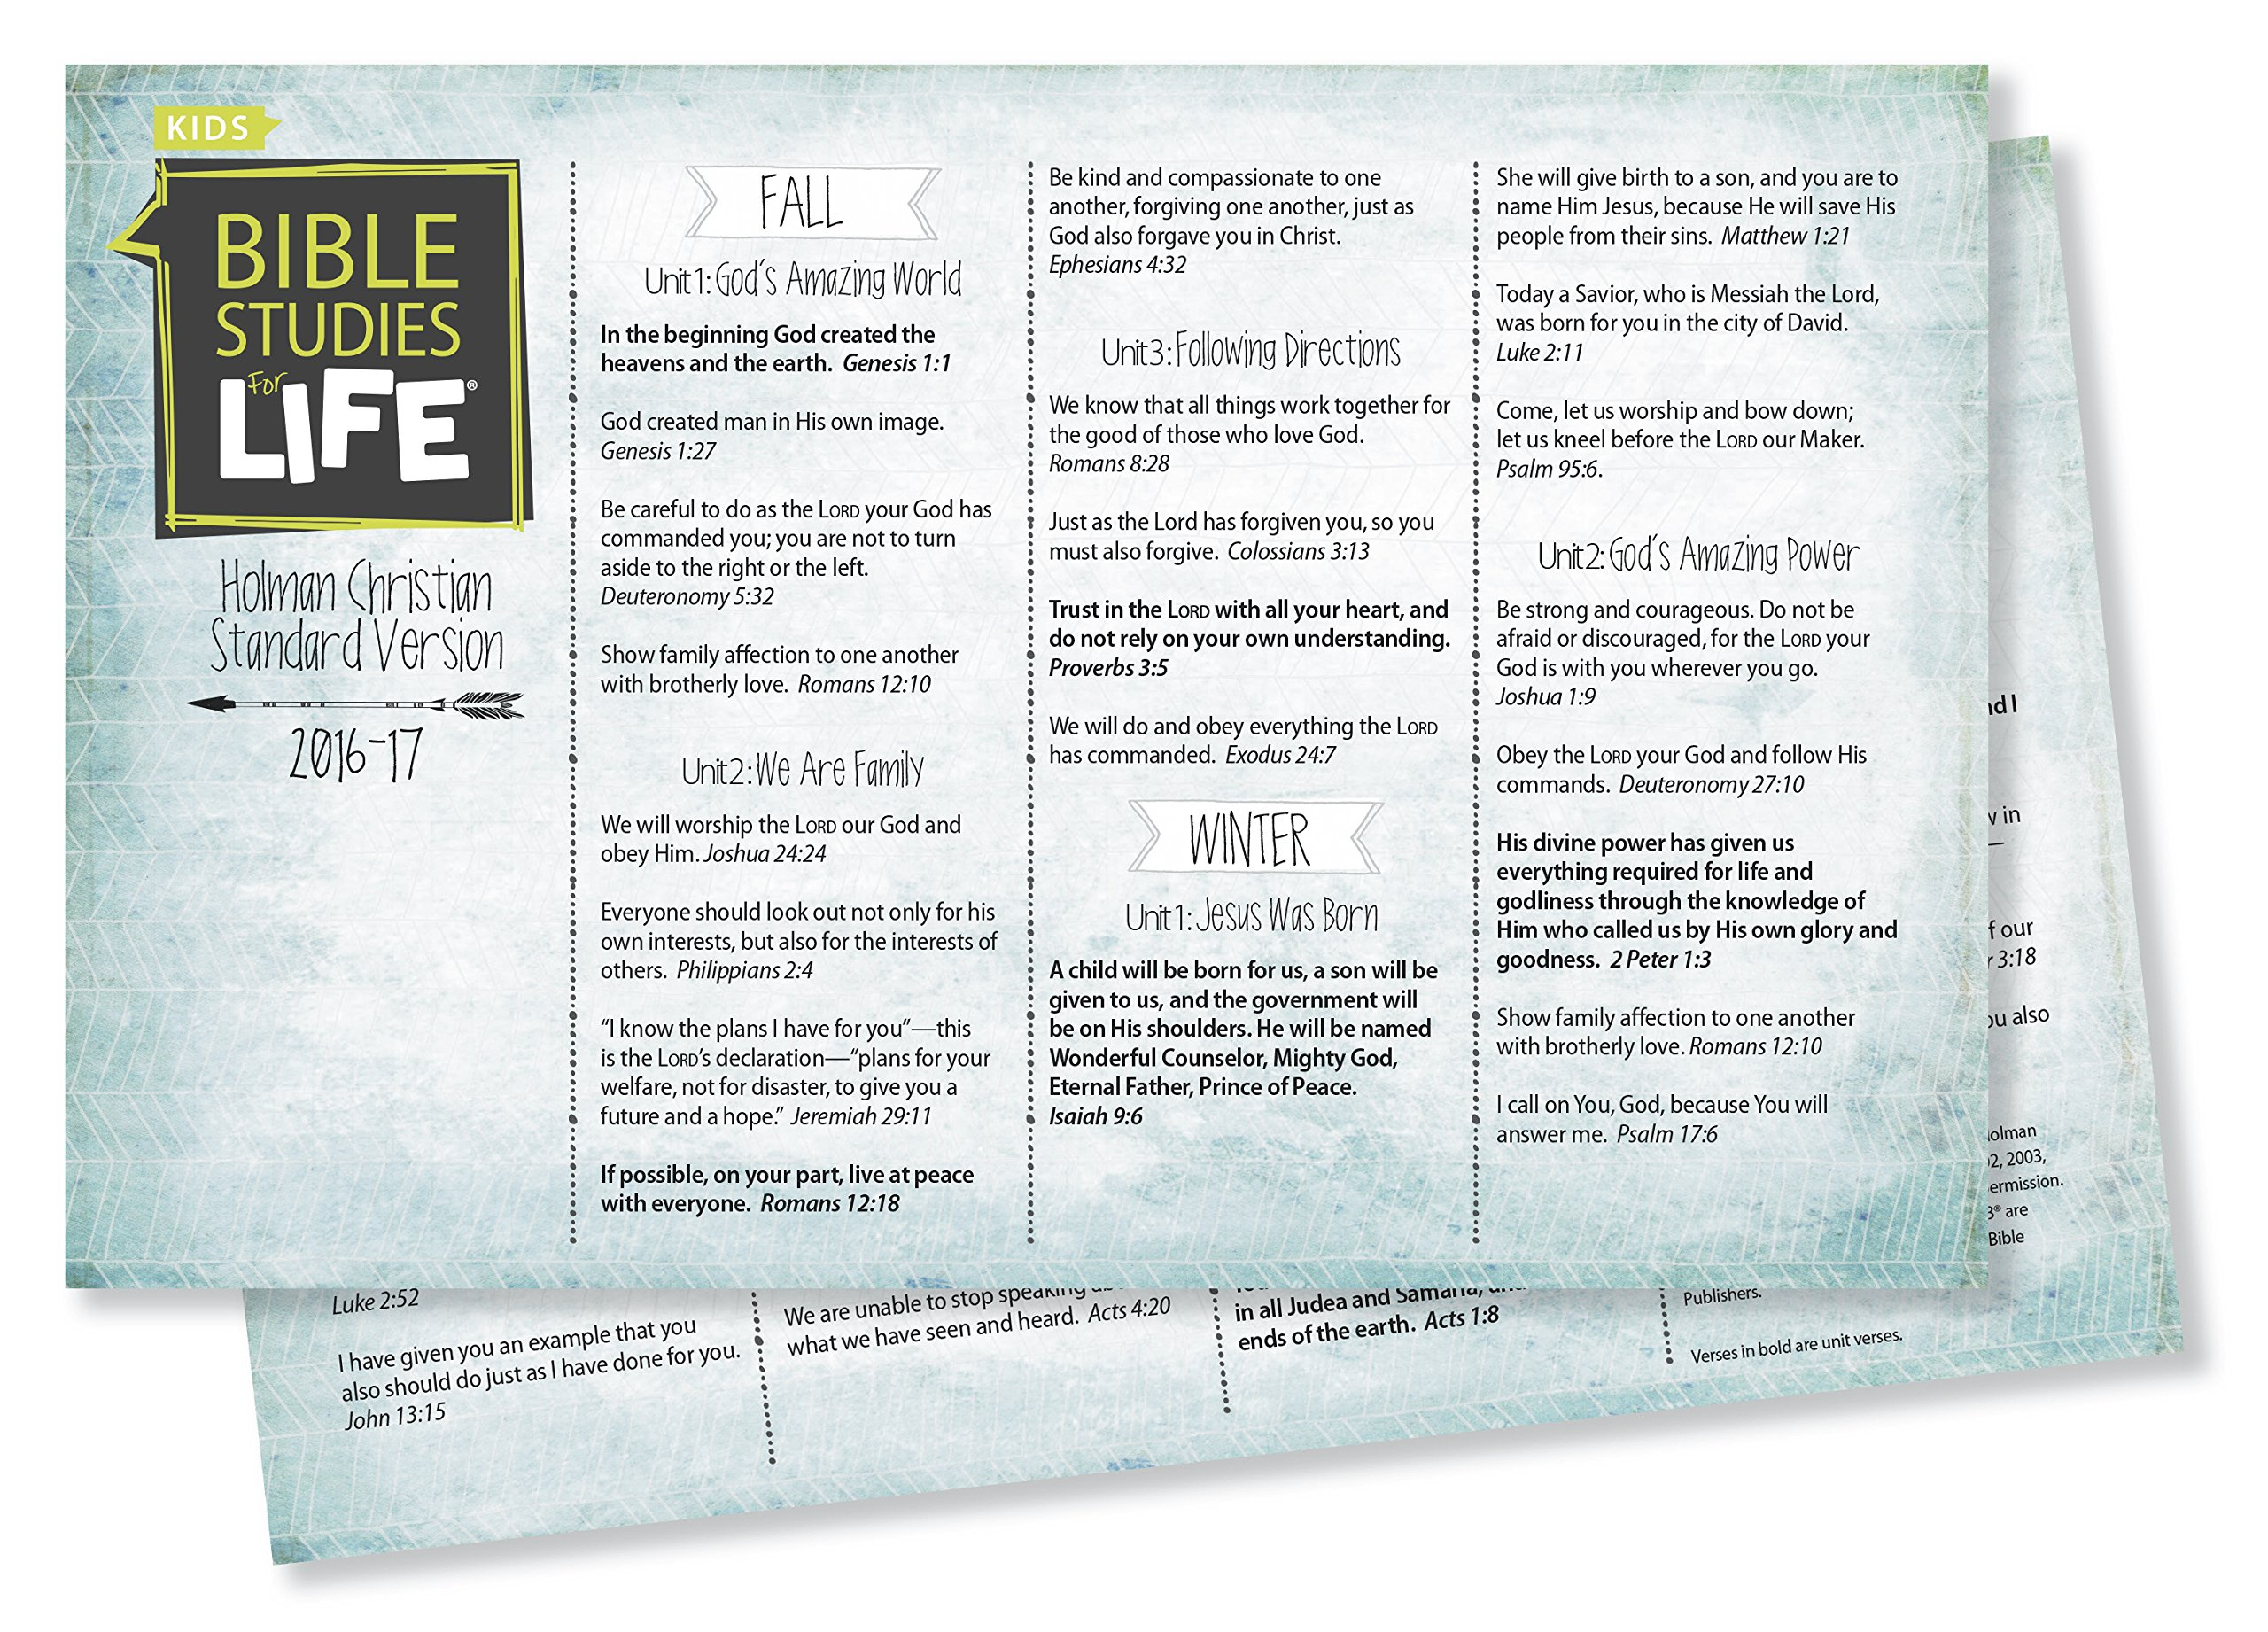 Bible Studies For Life: Kids Verse Cards for 2016-2017 - KJV Pkg  10